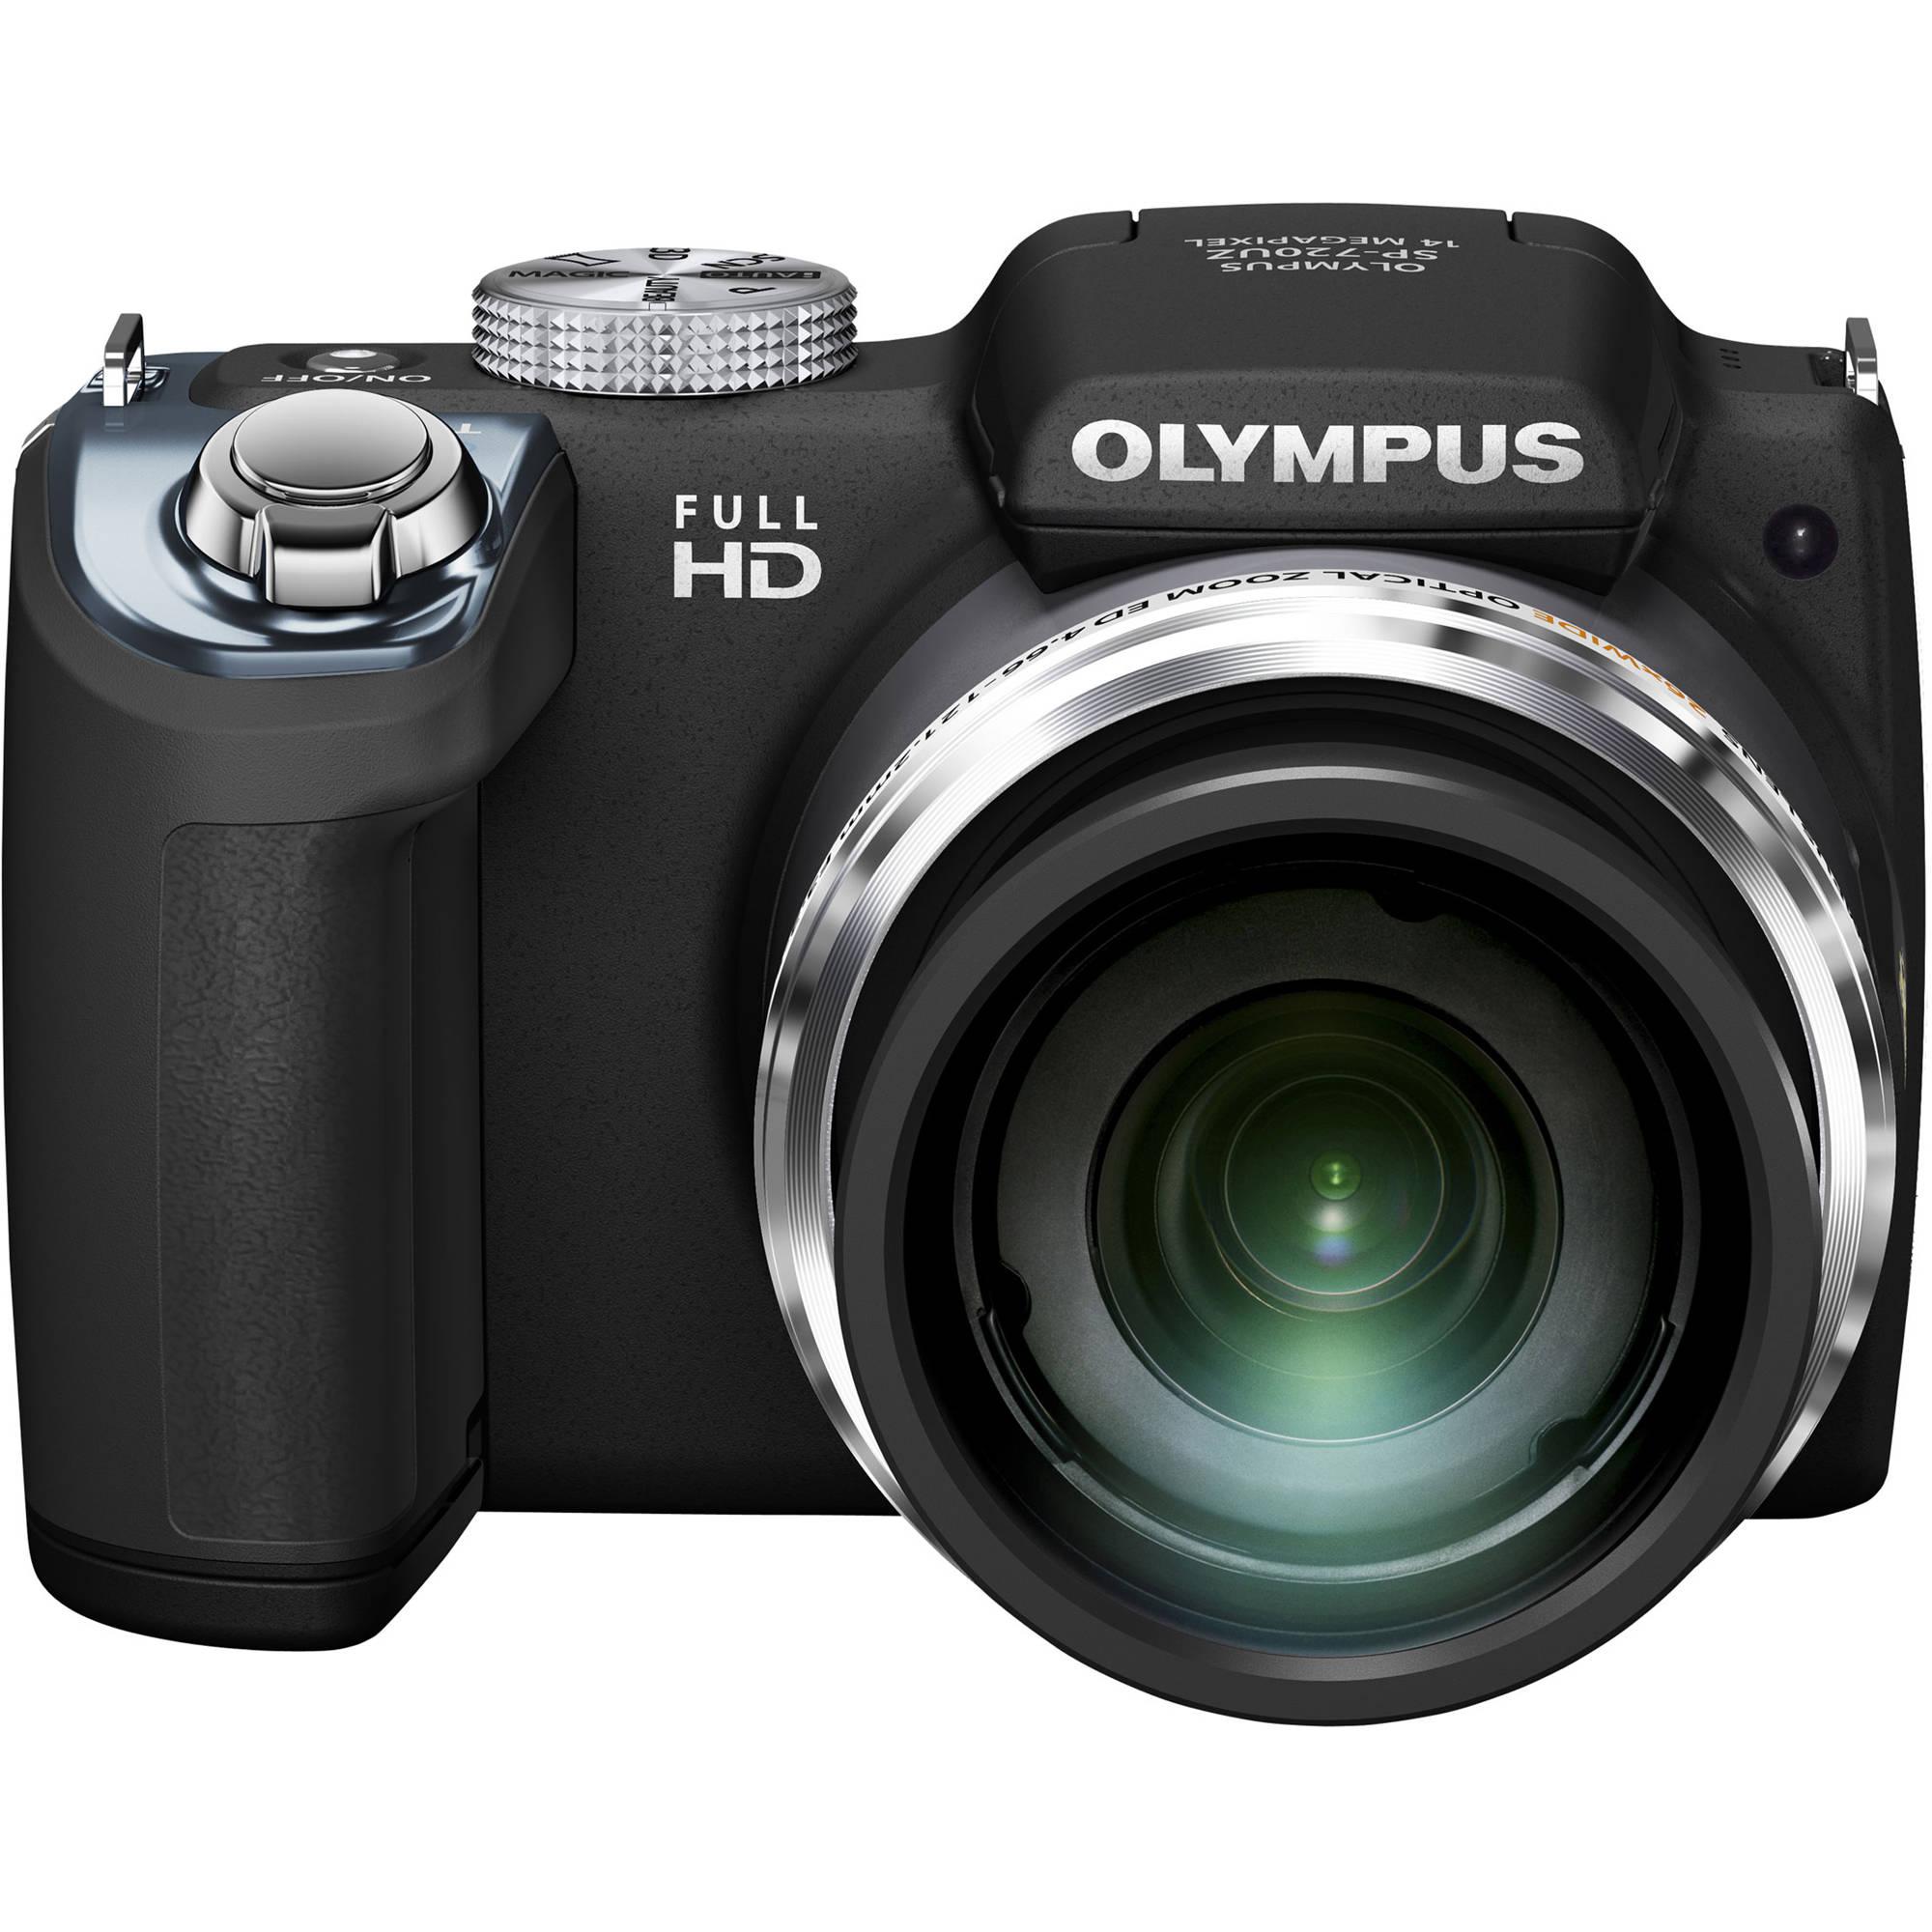 olympus sp 720uz digital camera black v103030bu000 b h photo rh bhphotovideo com Olympus SP- 810UZ 14MP Digital Camera Olympus Cameras